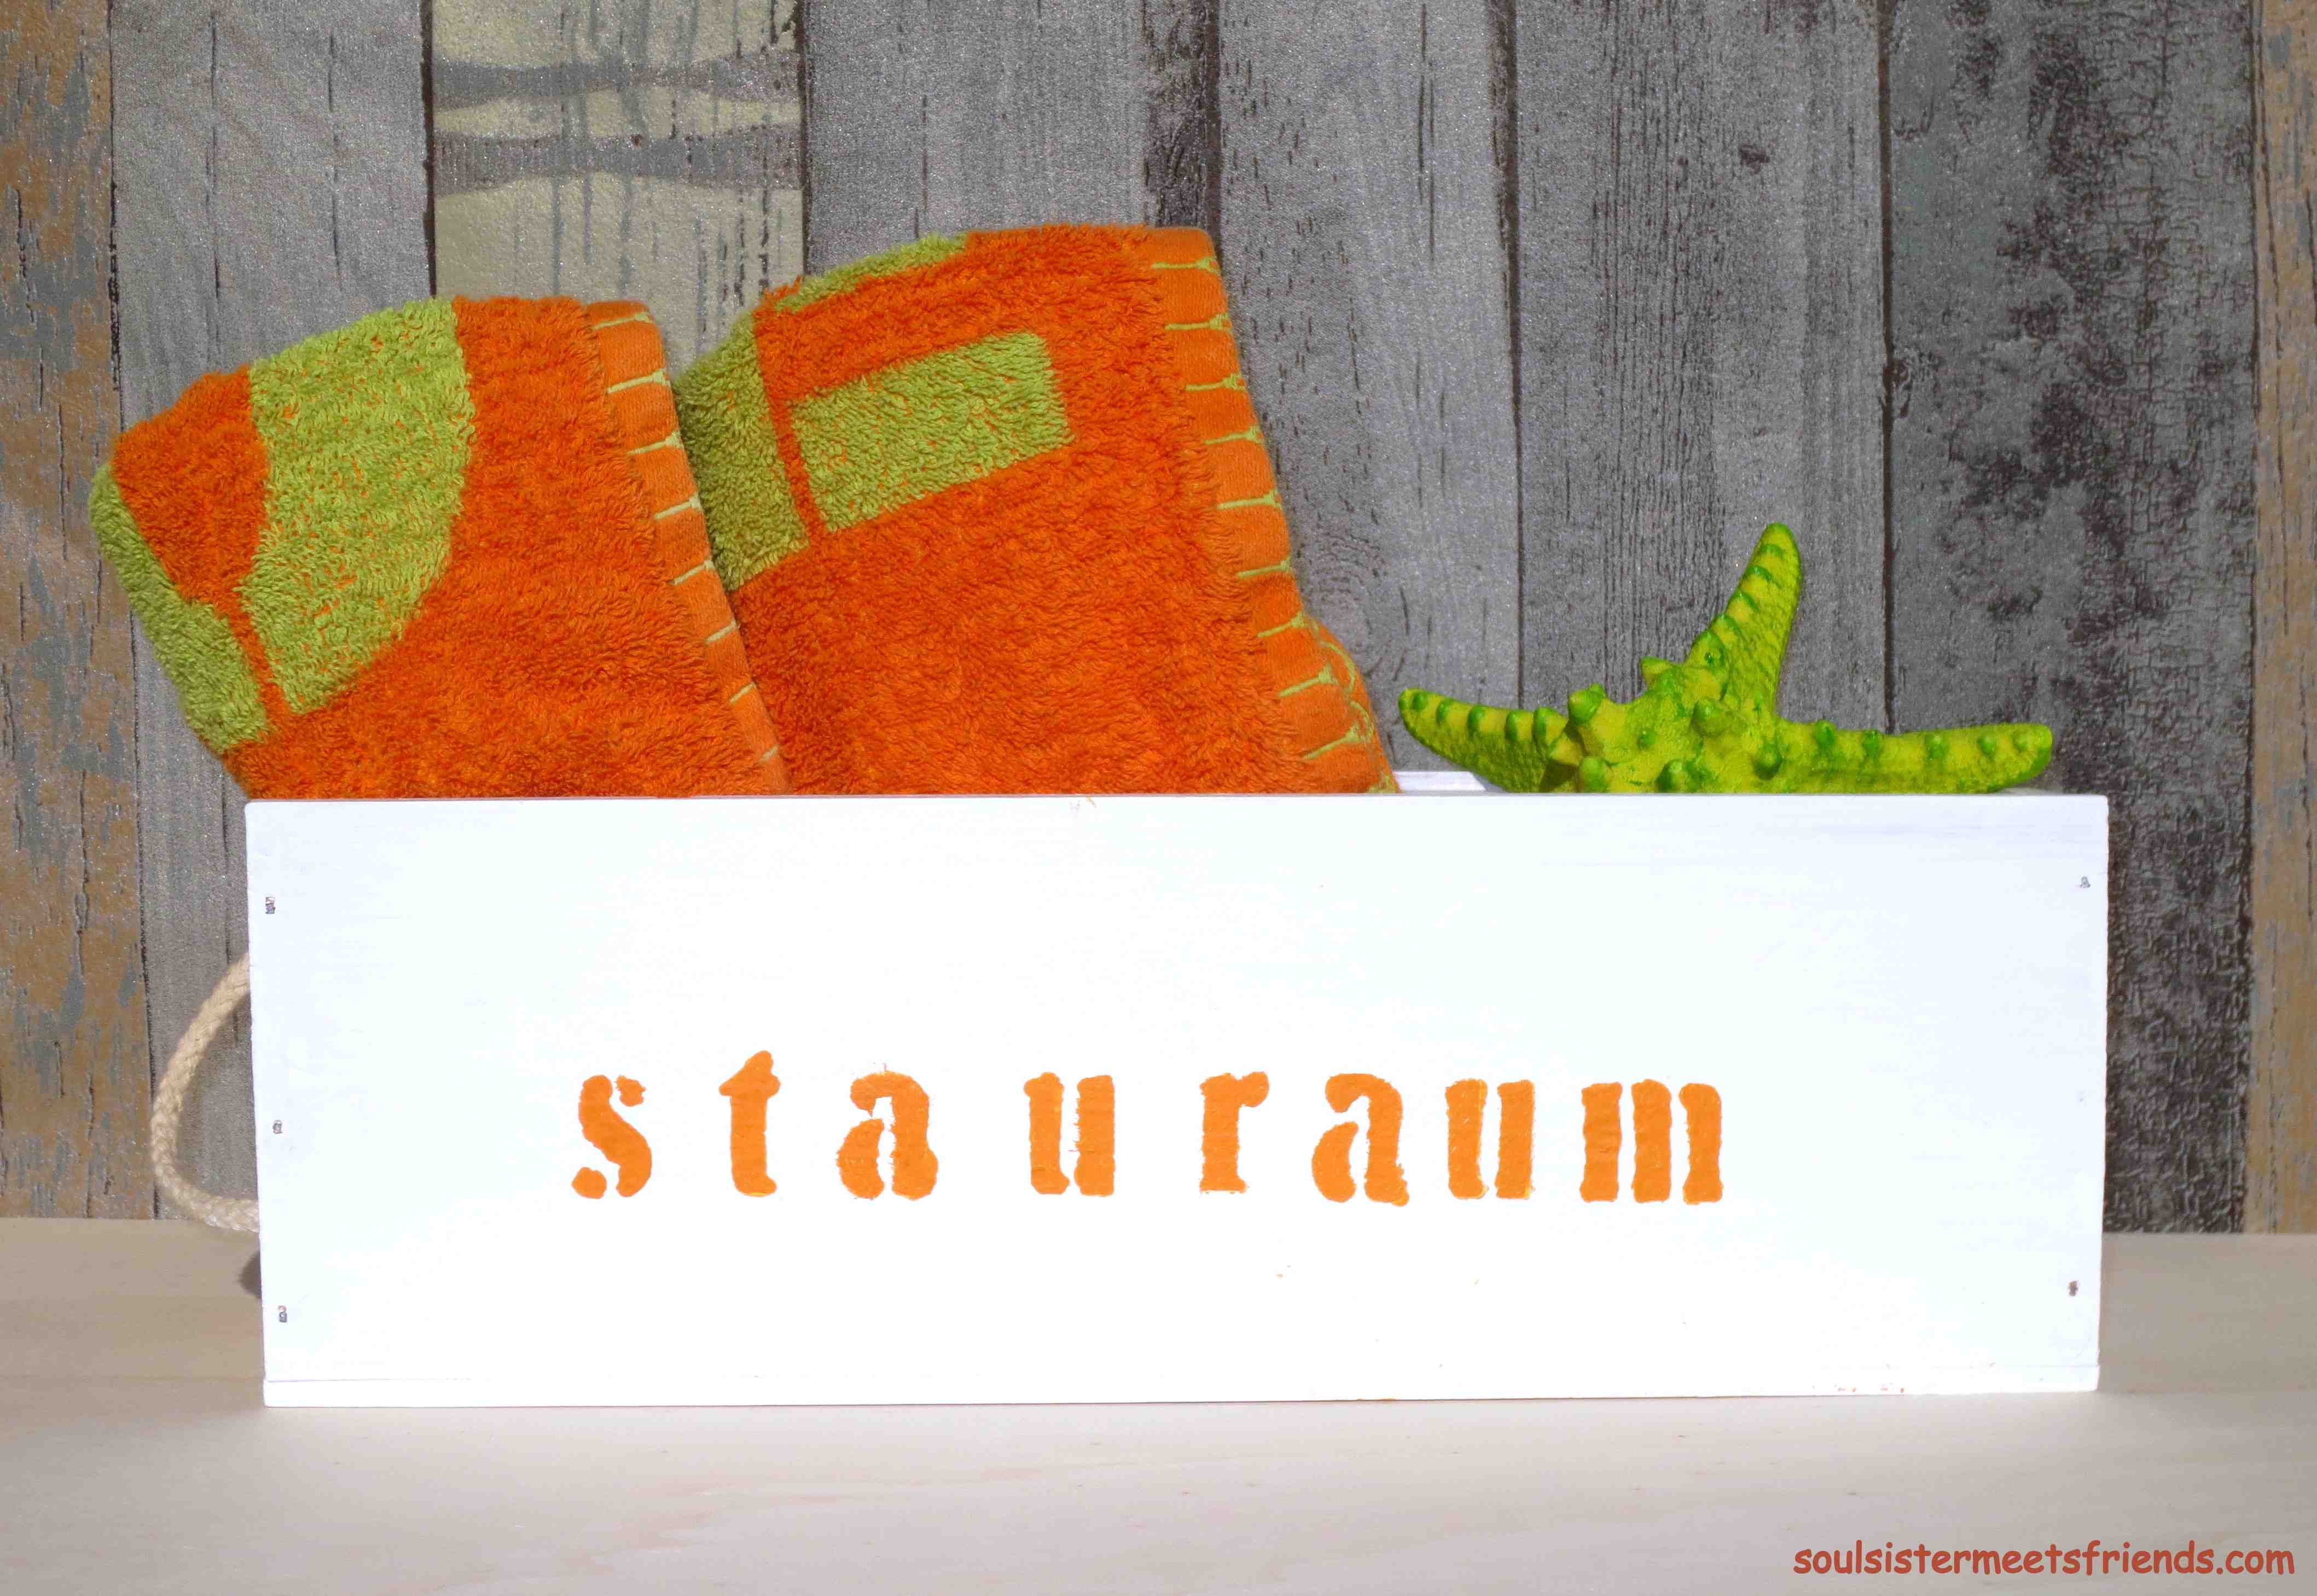 Stauraum_smf